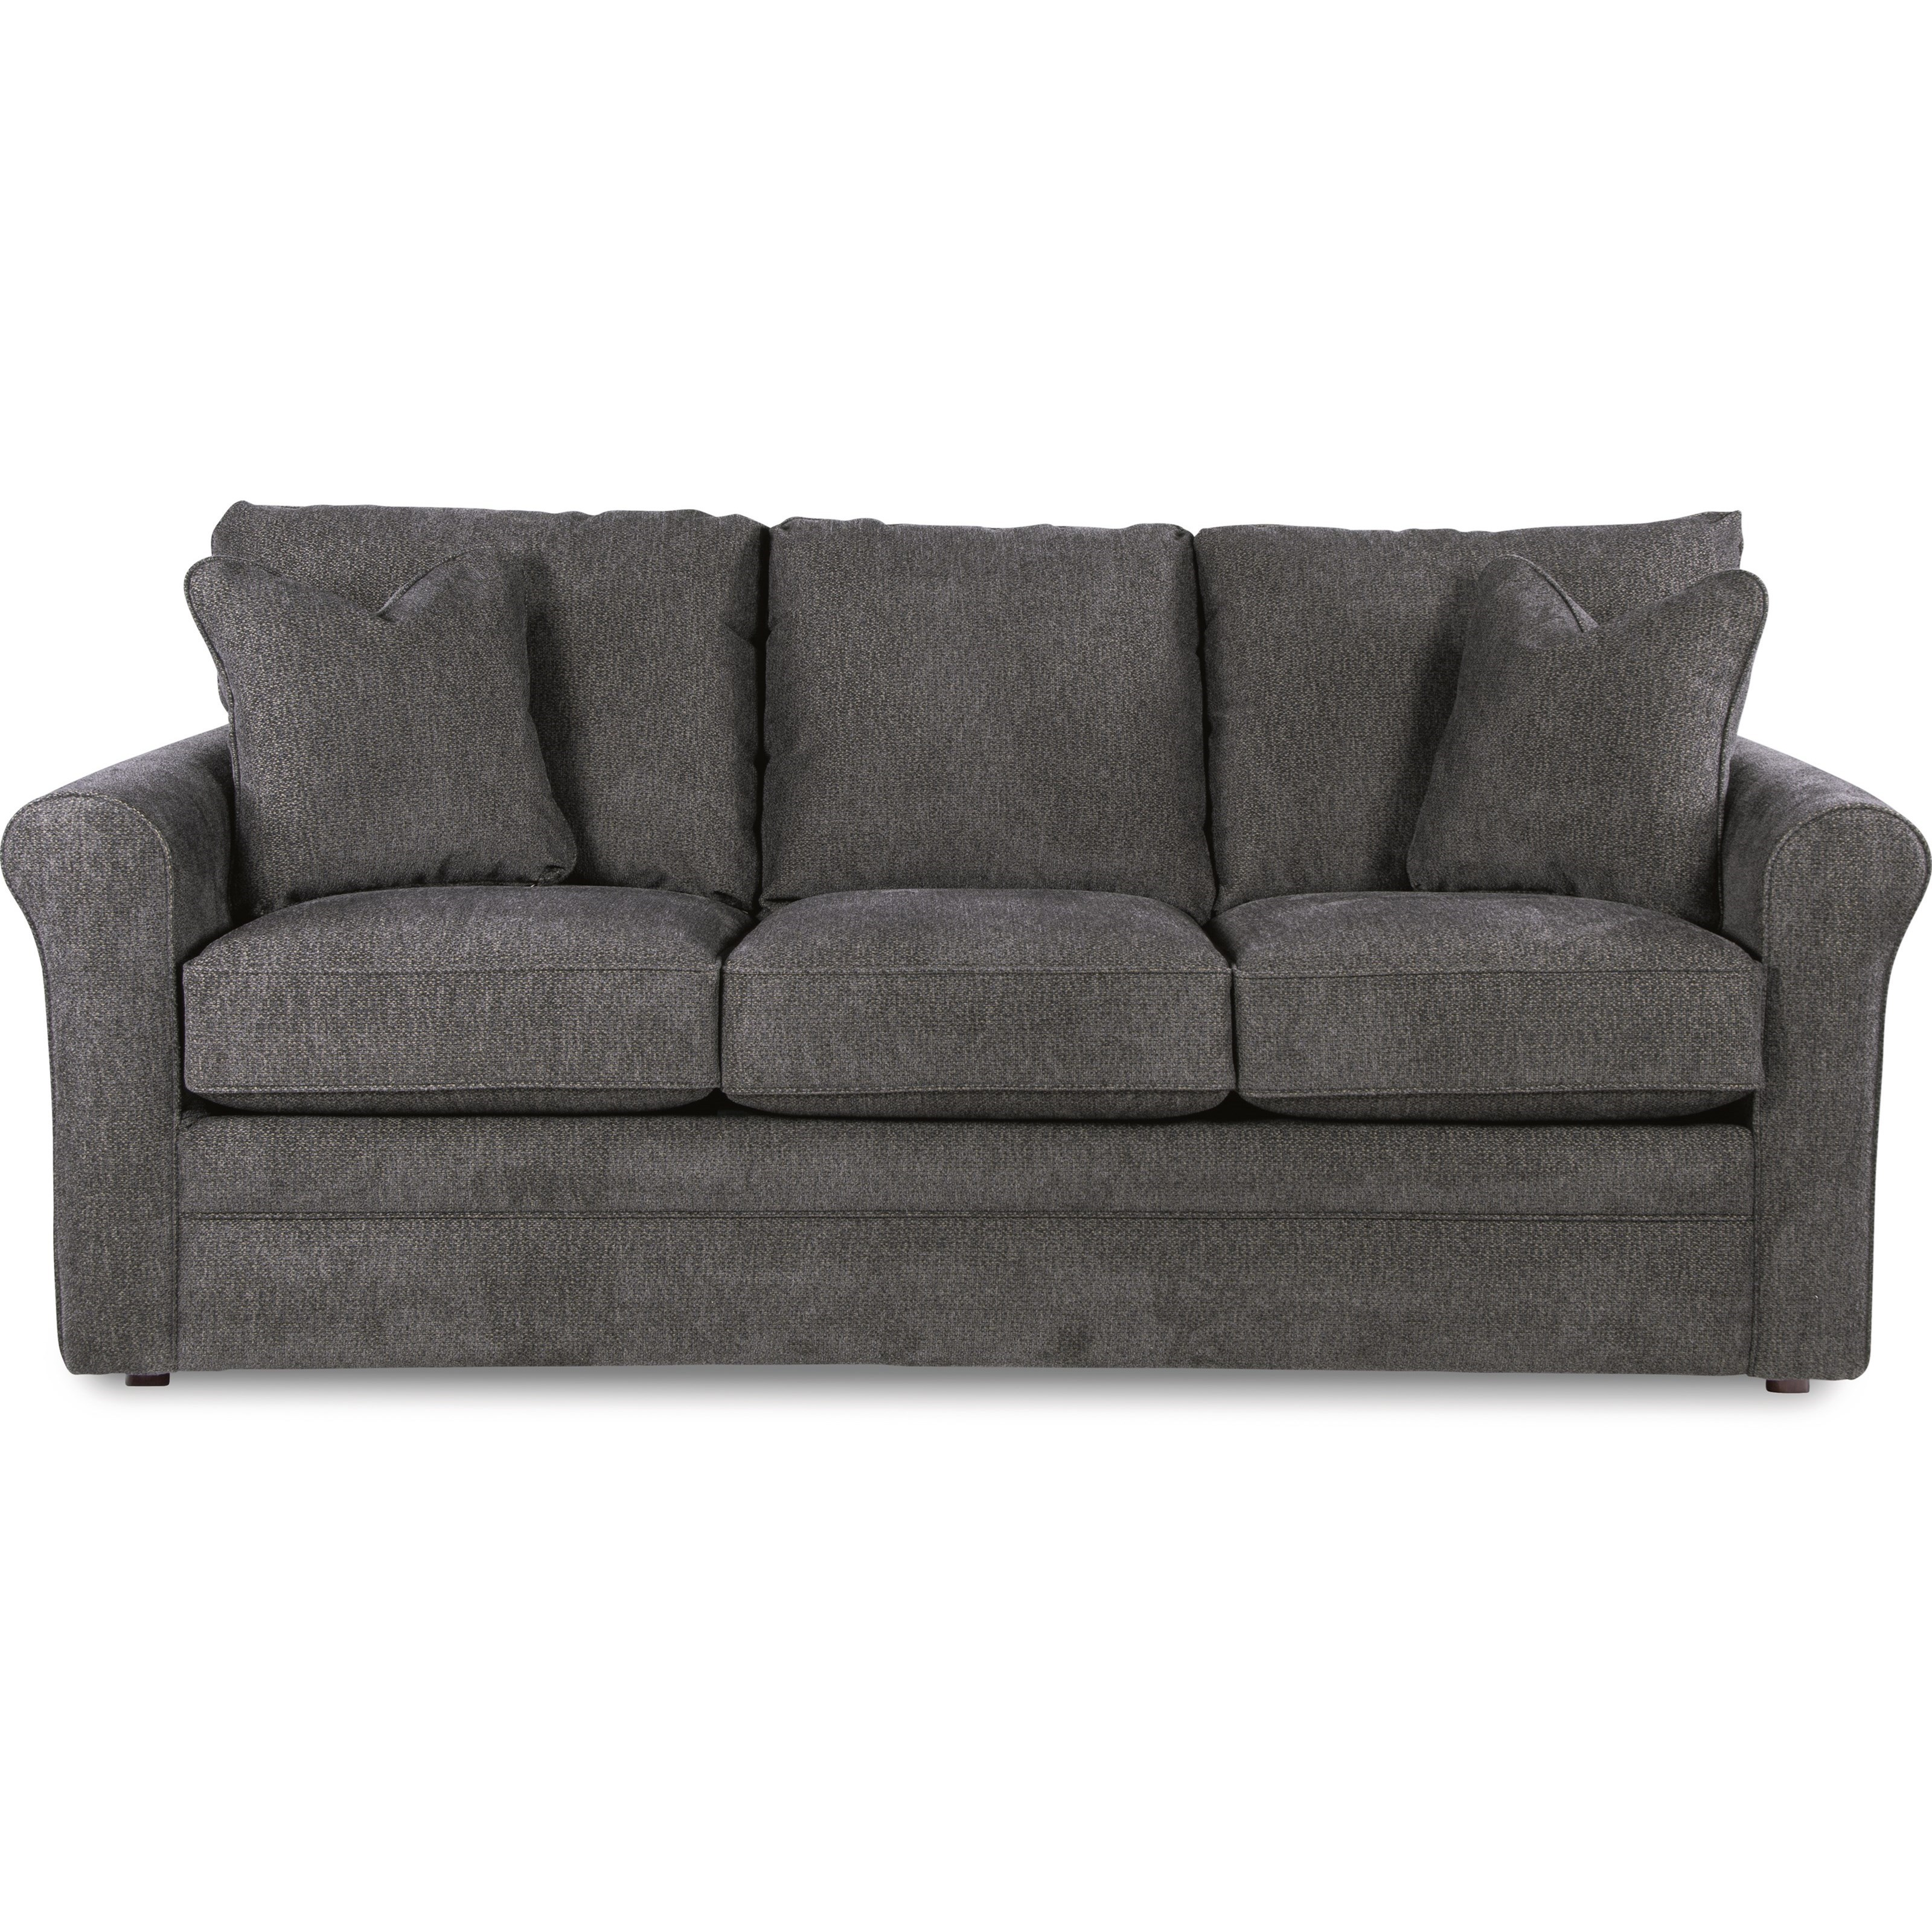 La Z Boy Leah Supreme Comfort Queen Sleep Sofa Godby